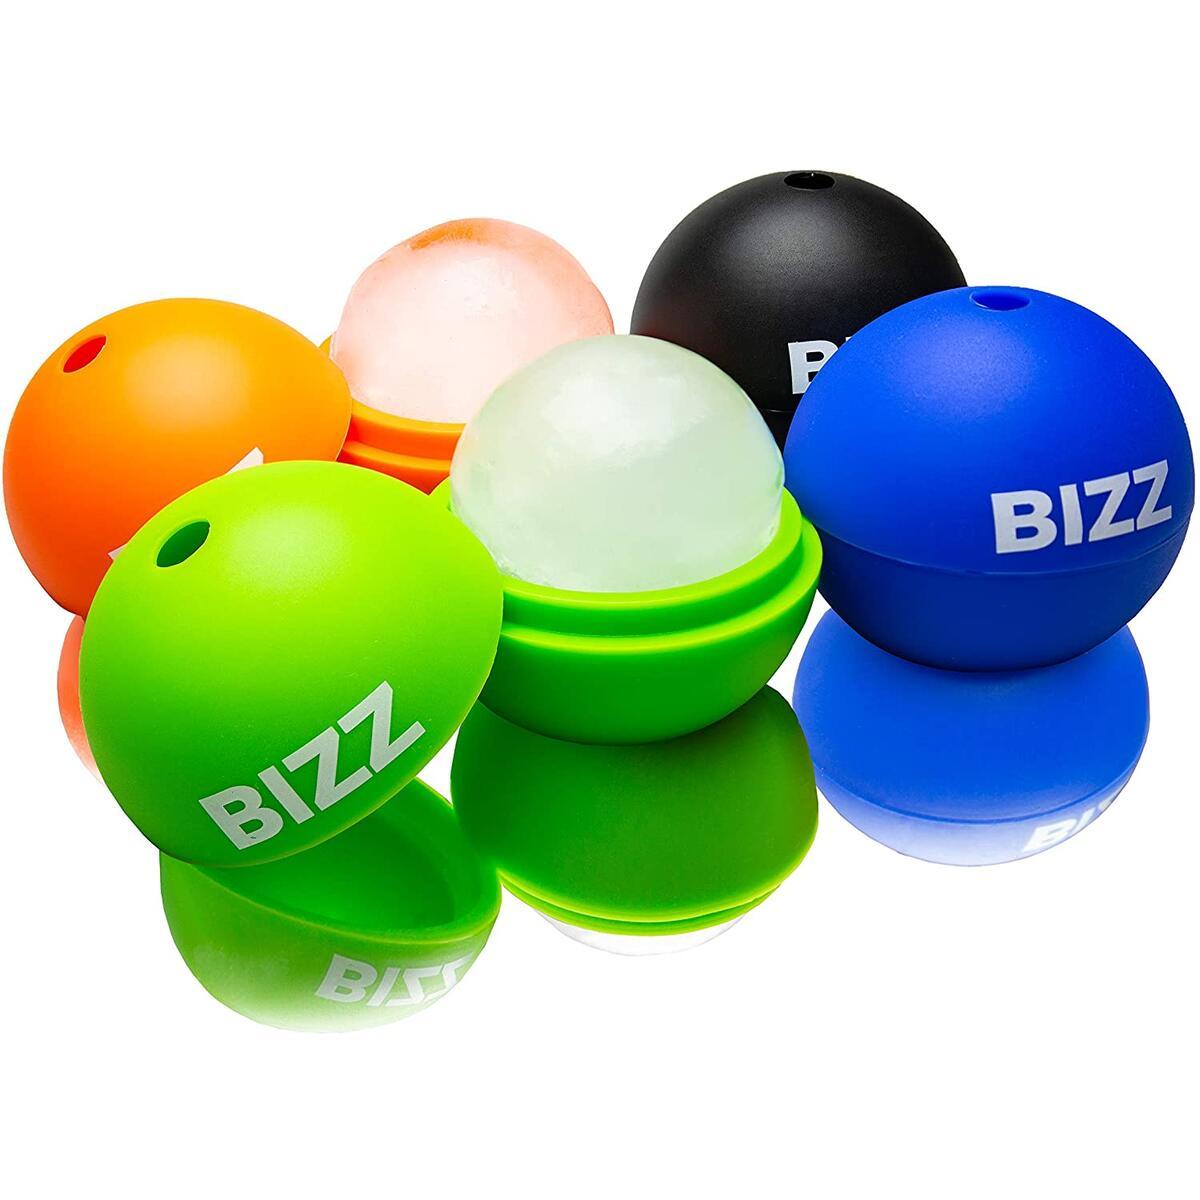 Ice Molds - Round Ice Balls - 4 Pack